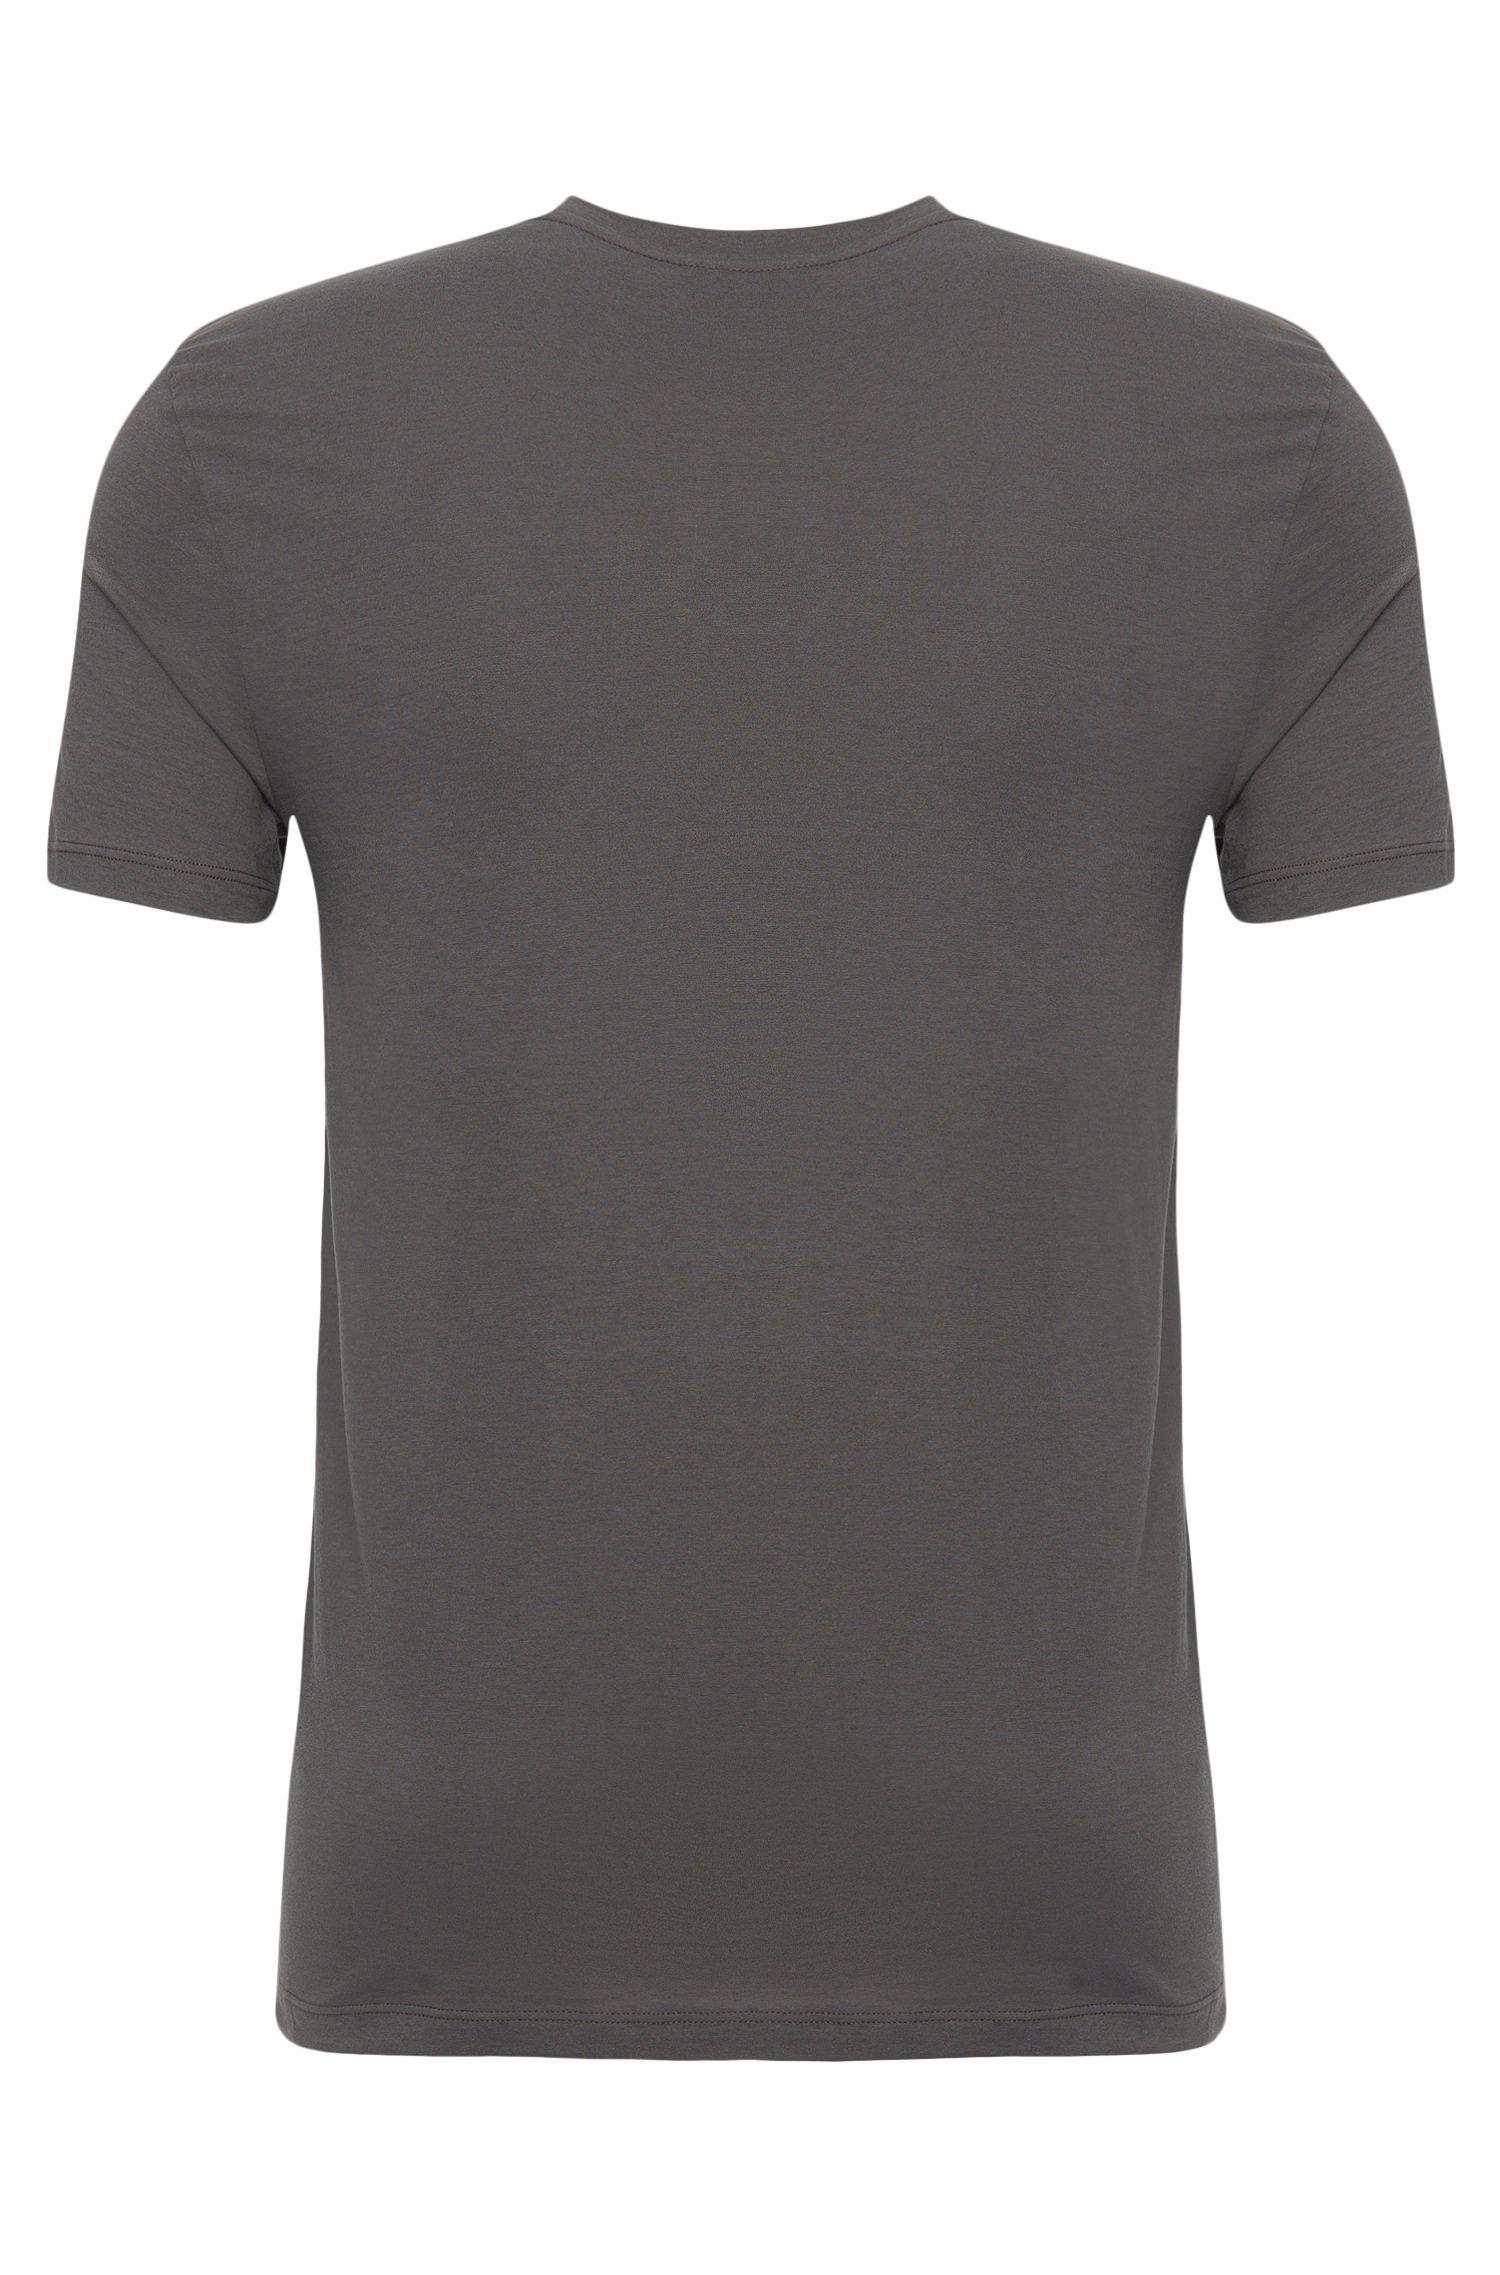 T-shirt en coton à colV: «Shirt VN BM»